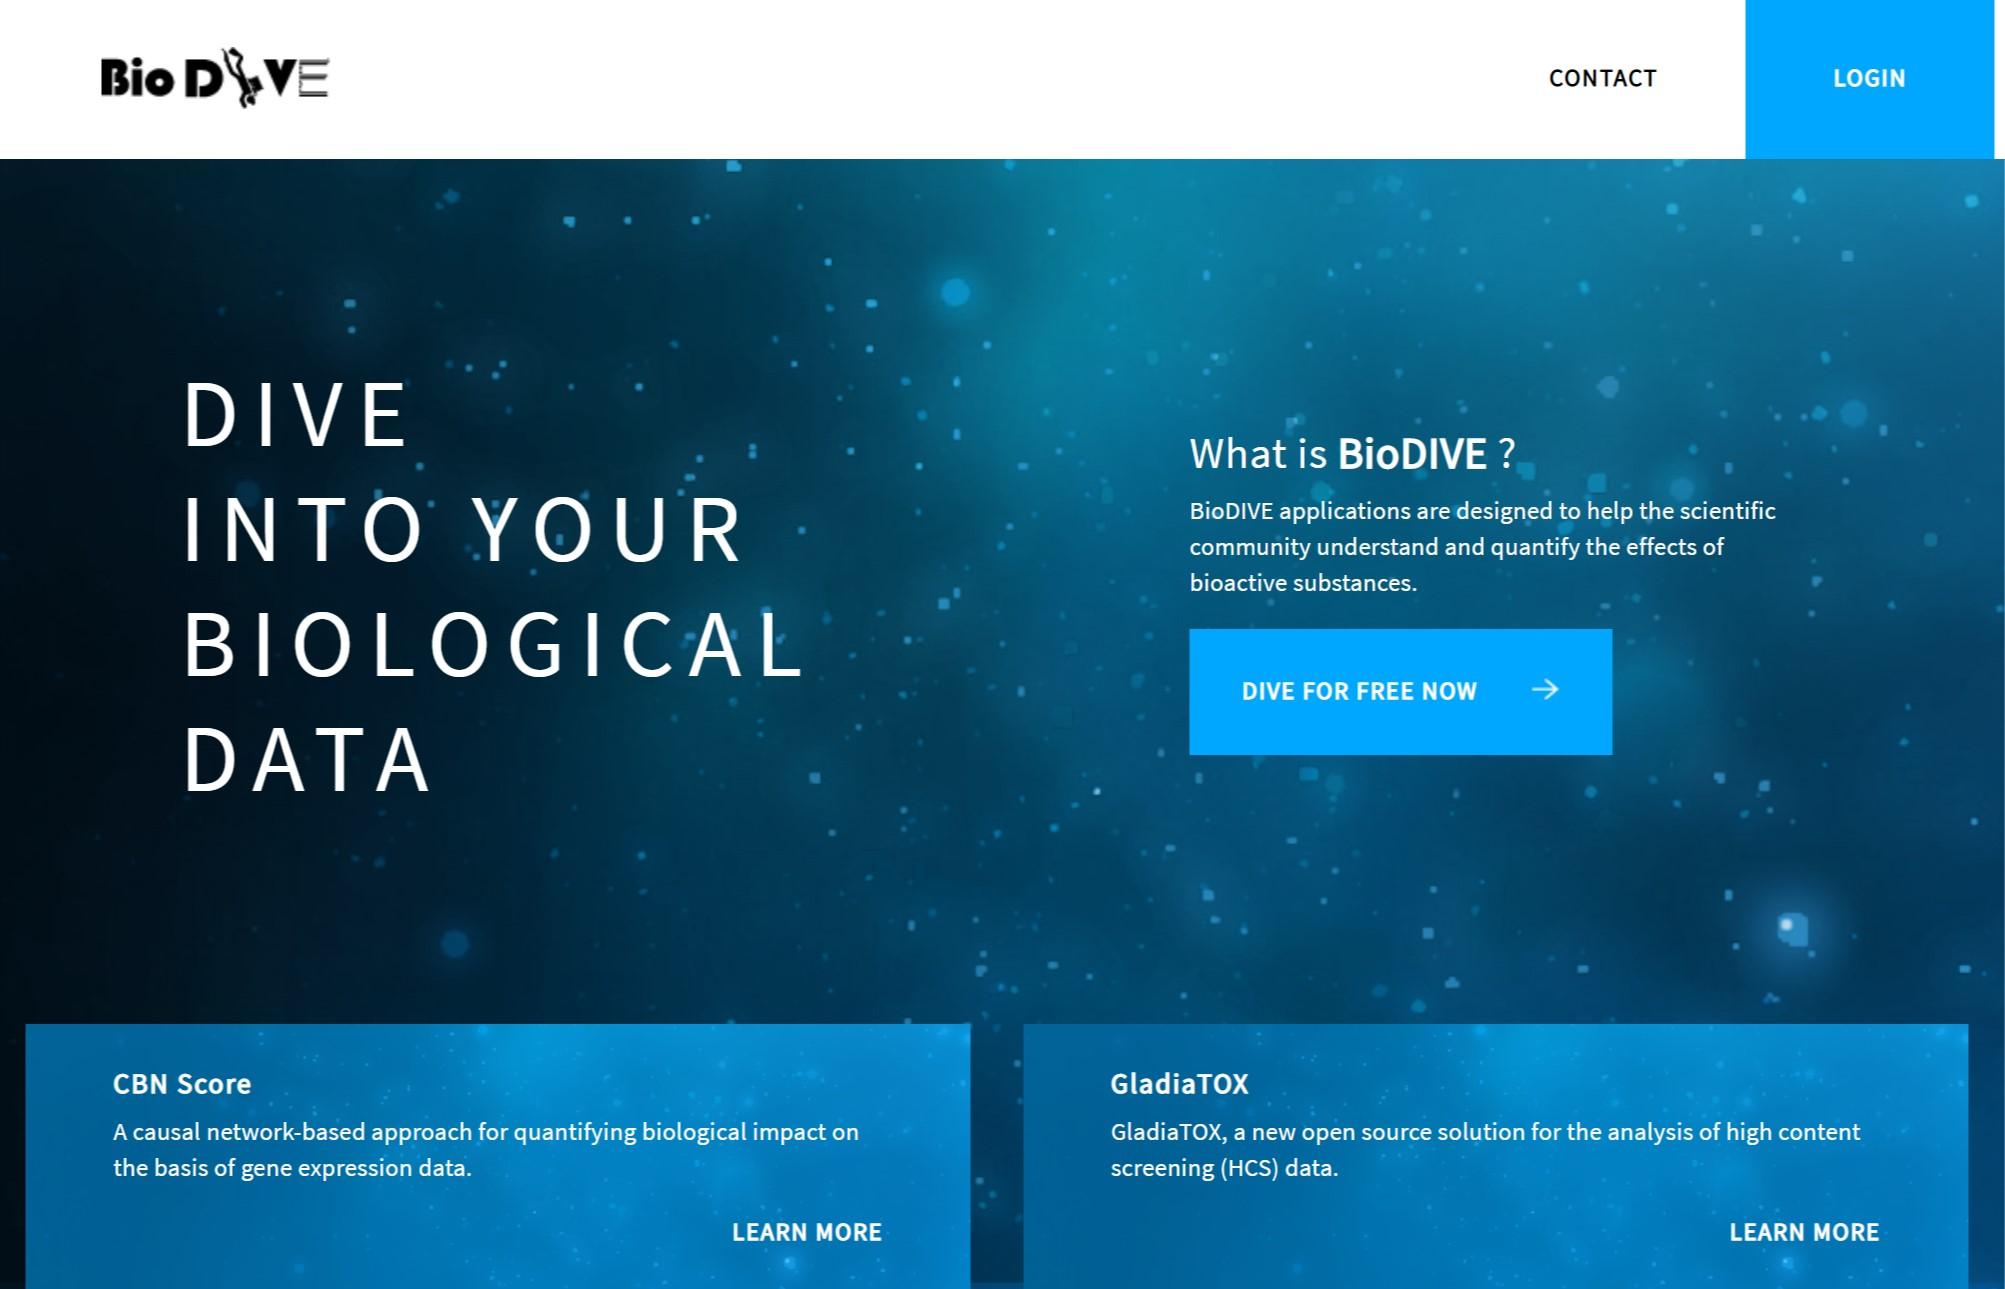 BioDIVE landing page